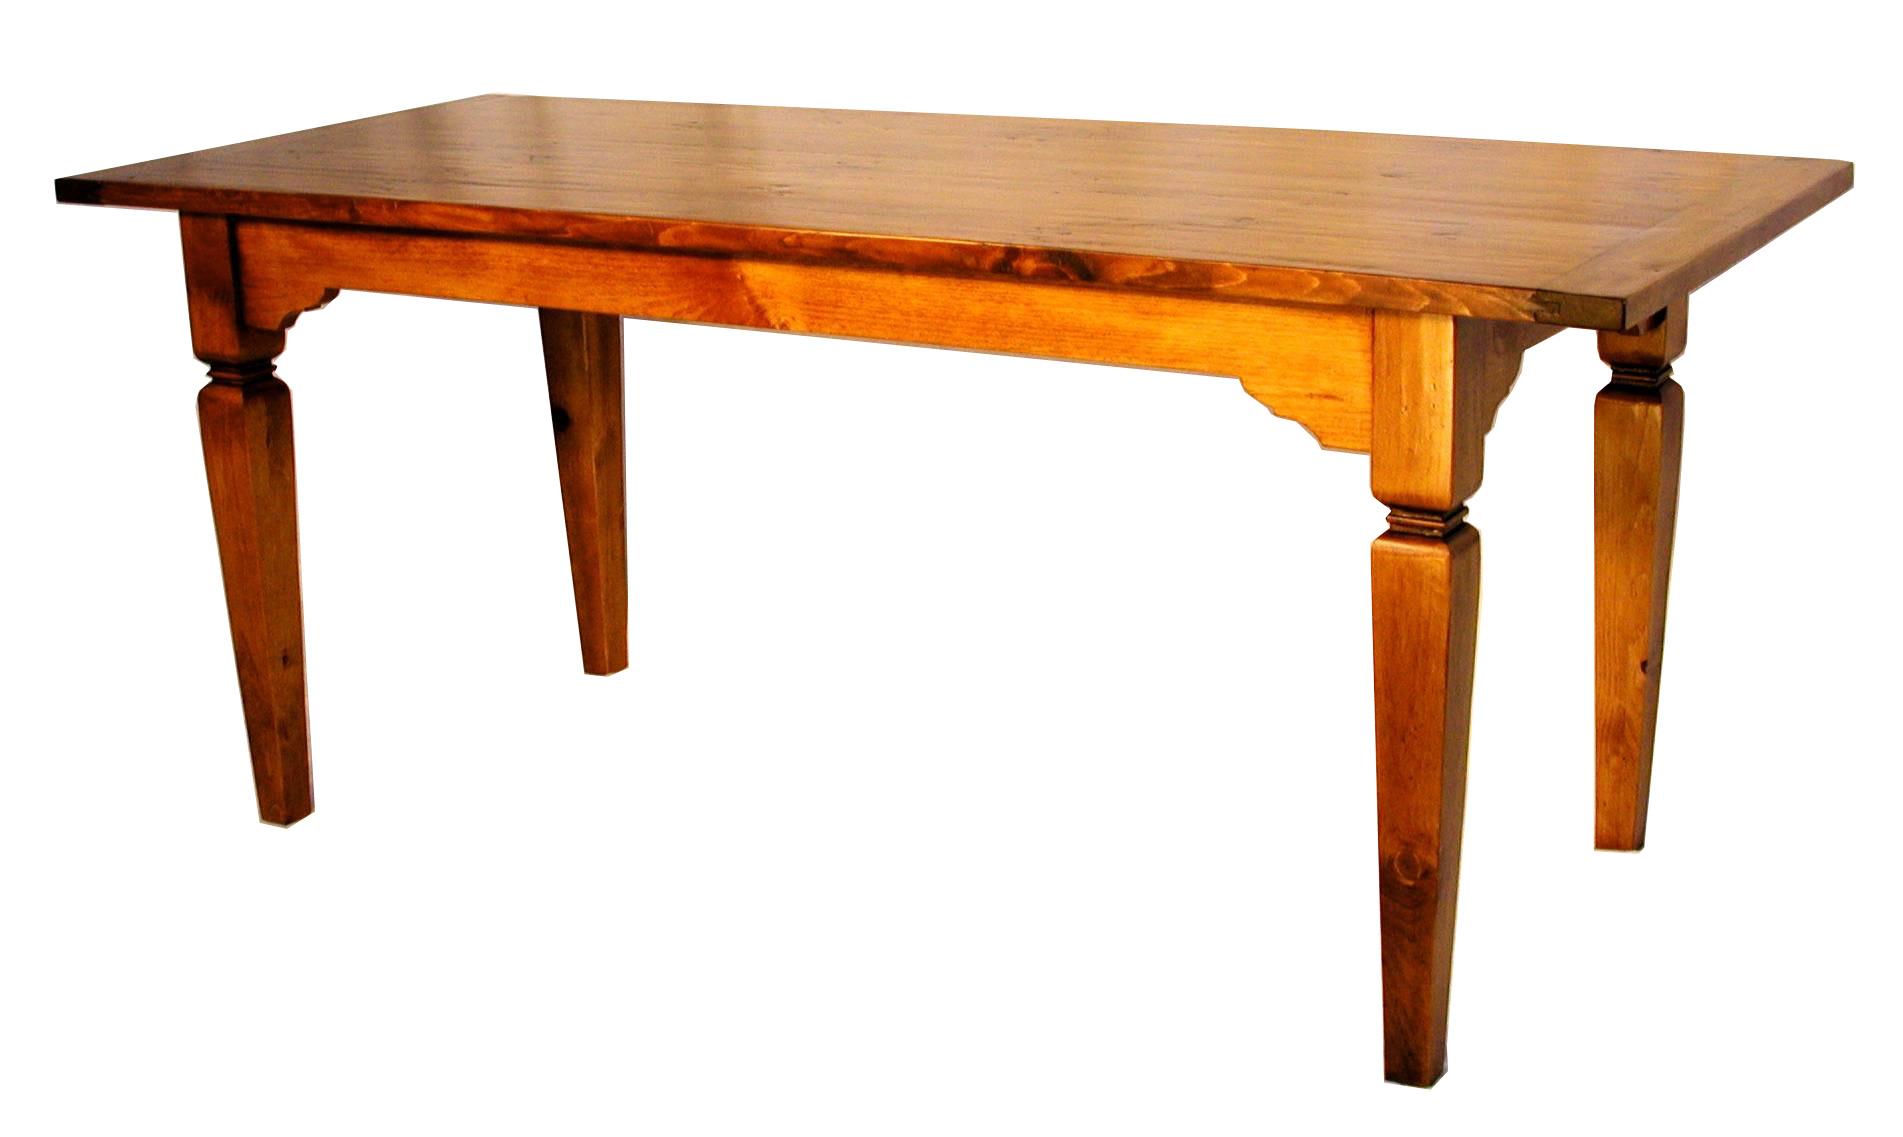 French Farm Table #2110